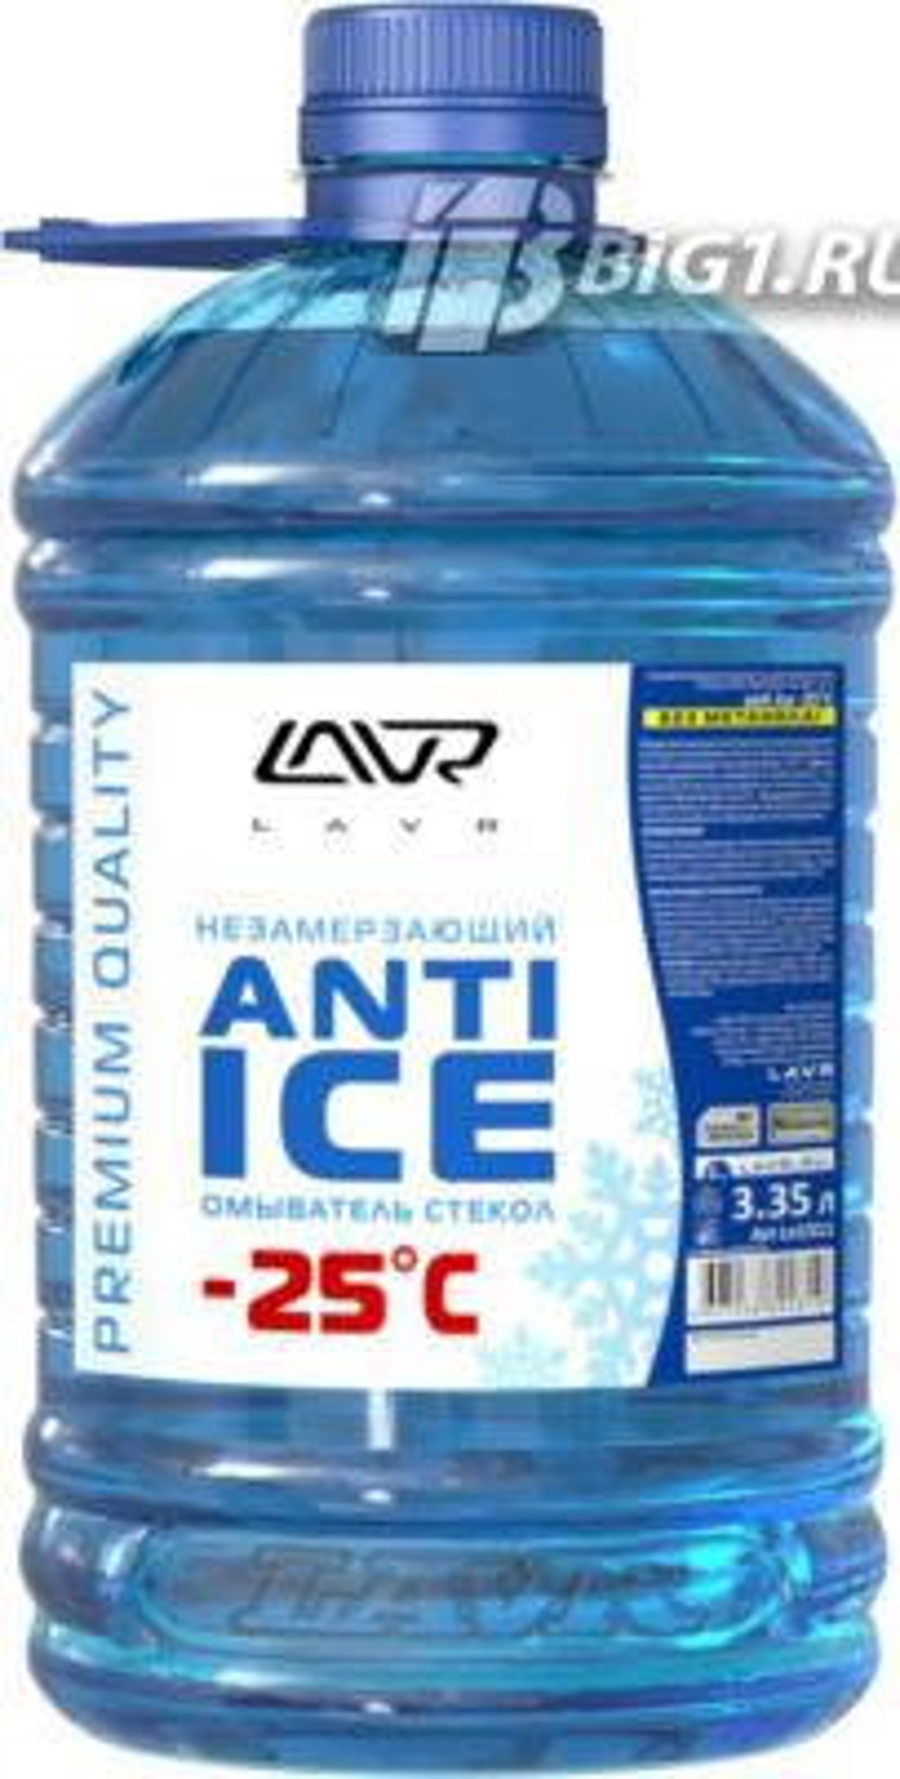 Незамерзающий омыватель стекол (-25) LAVR Anti Ice